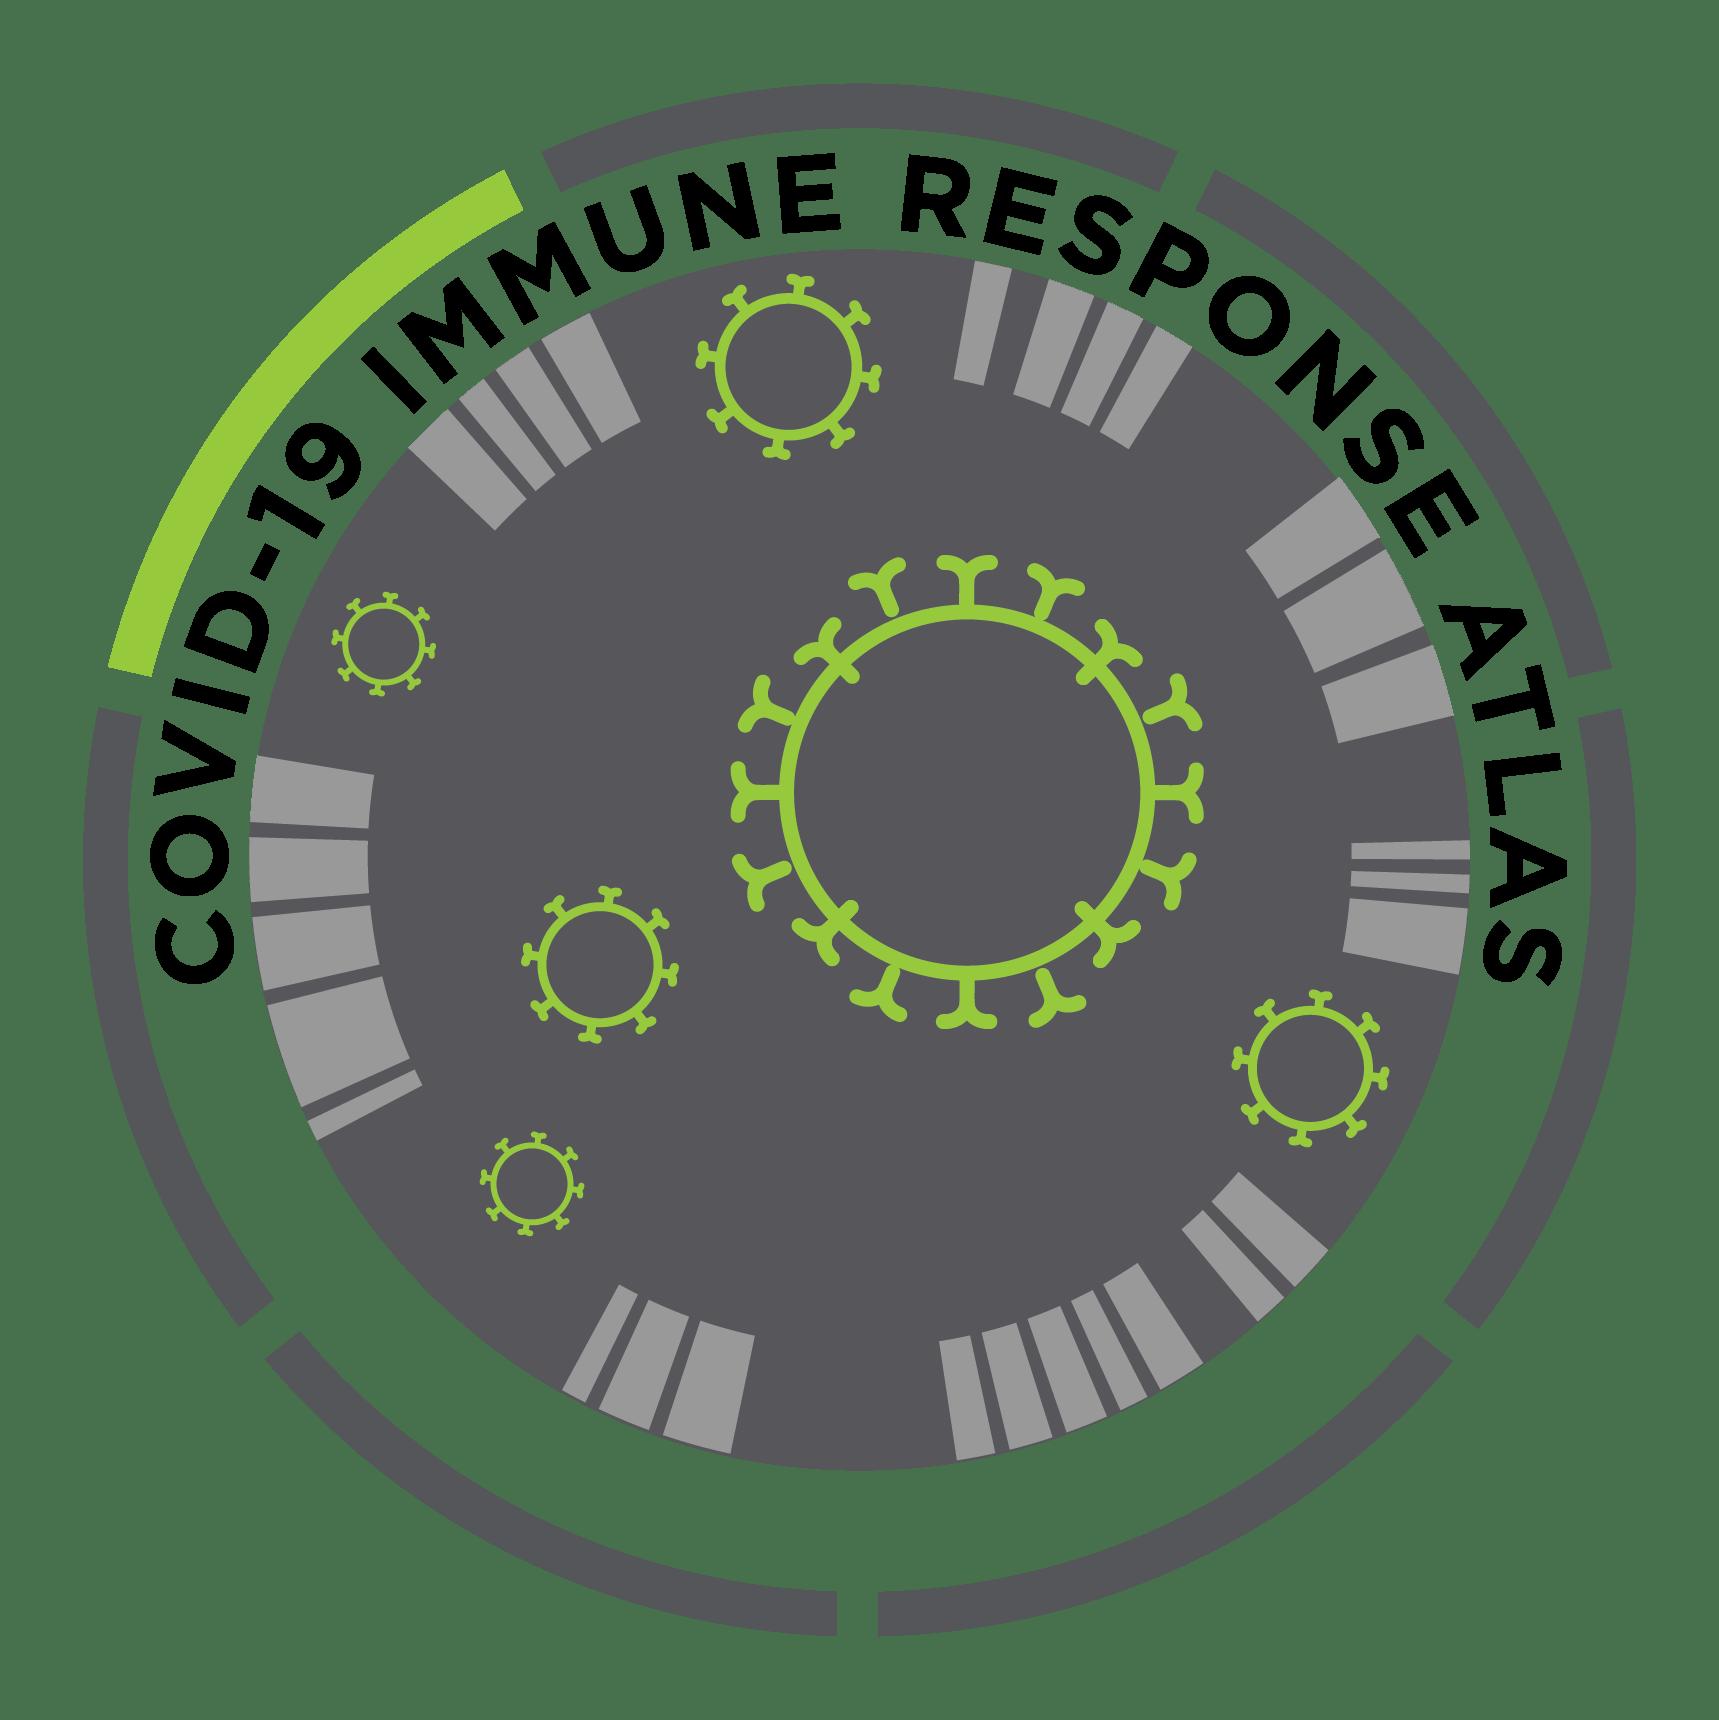 IM_MK2462_GeoMx COVID-19 Immune Response Atlas_FINAL